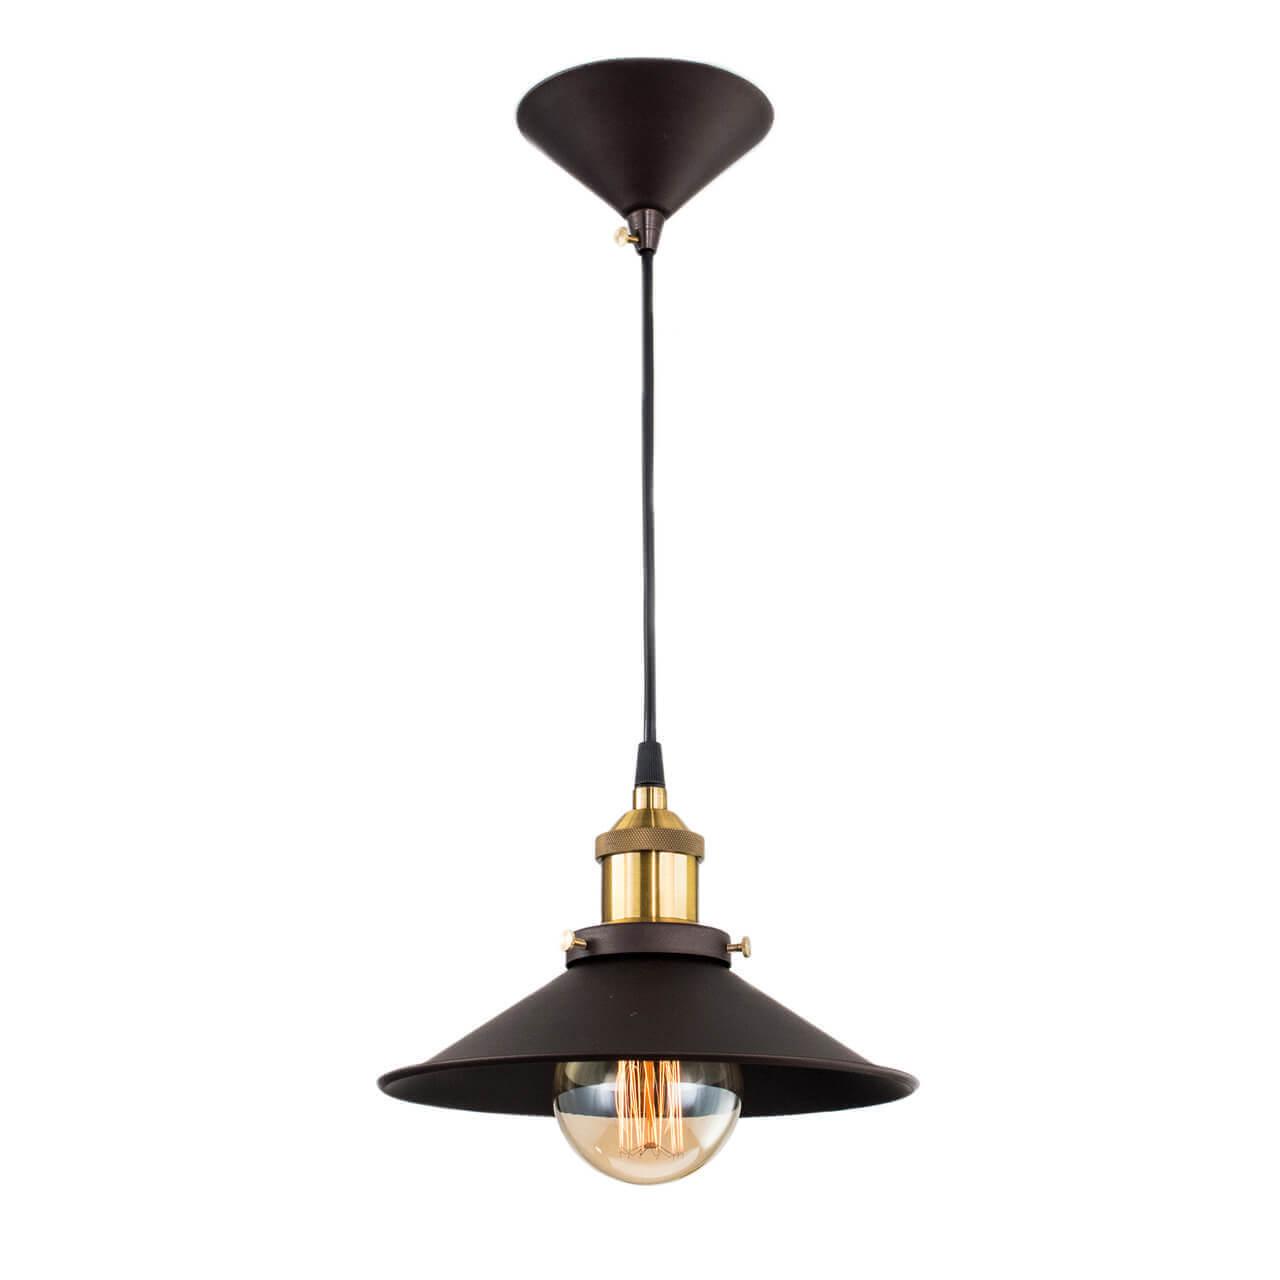 цена на Светильник Citilux CL450101 Эдисон